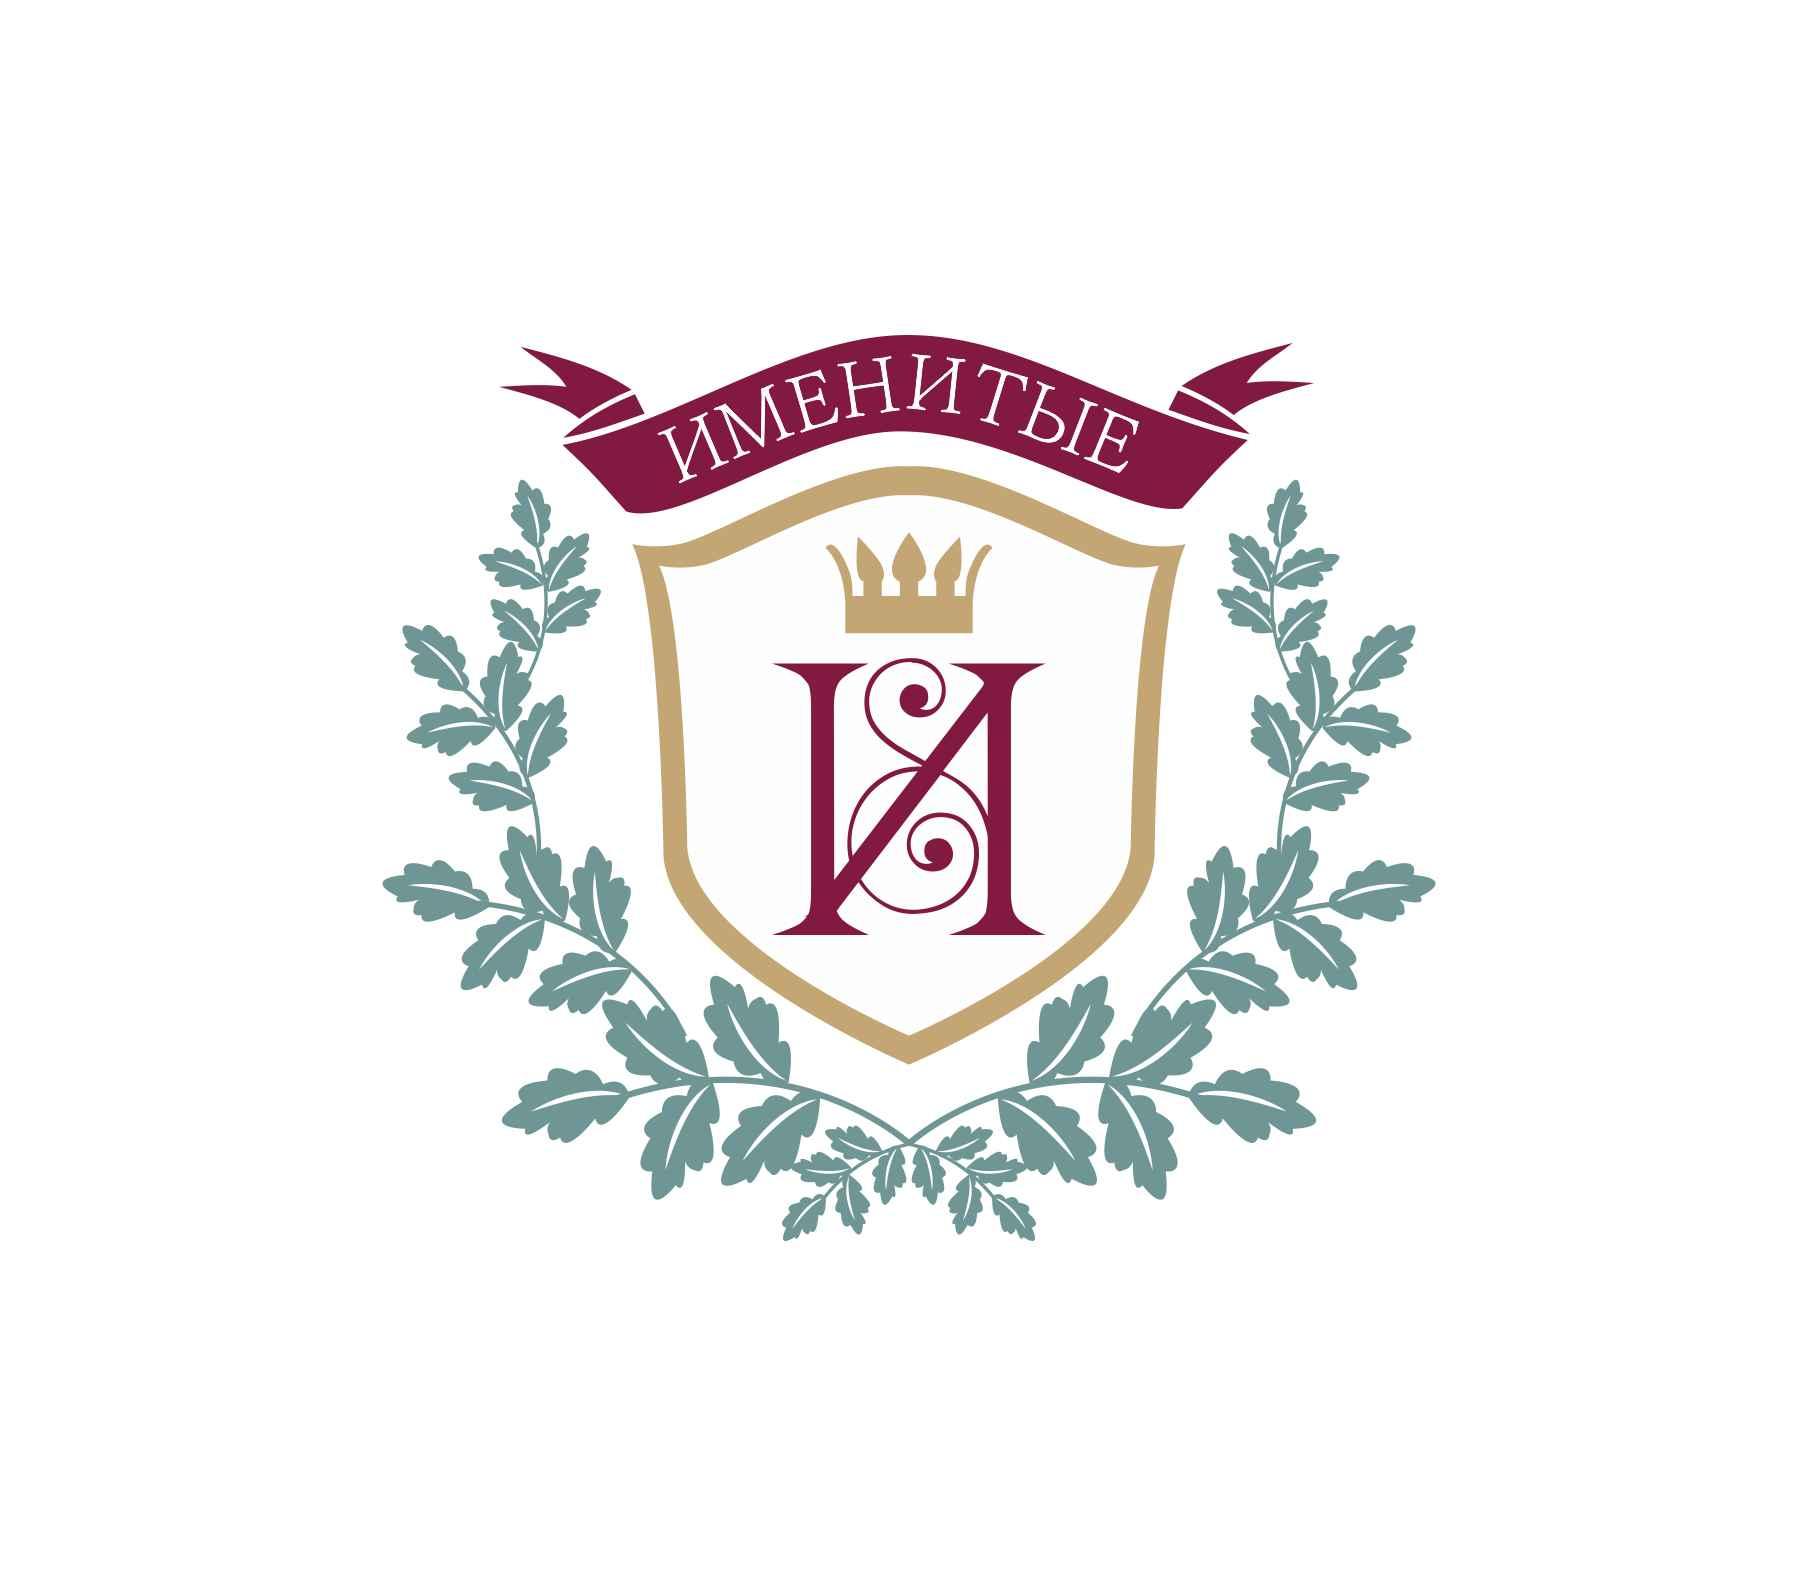 Логотип и фирменный стиль продуктов питания фото f_0355bc202b31e8dc.jpg